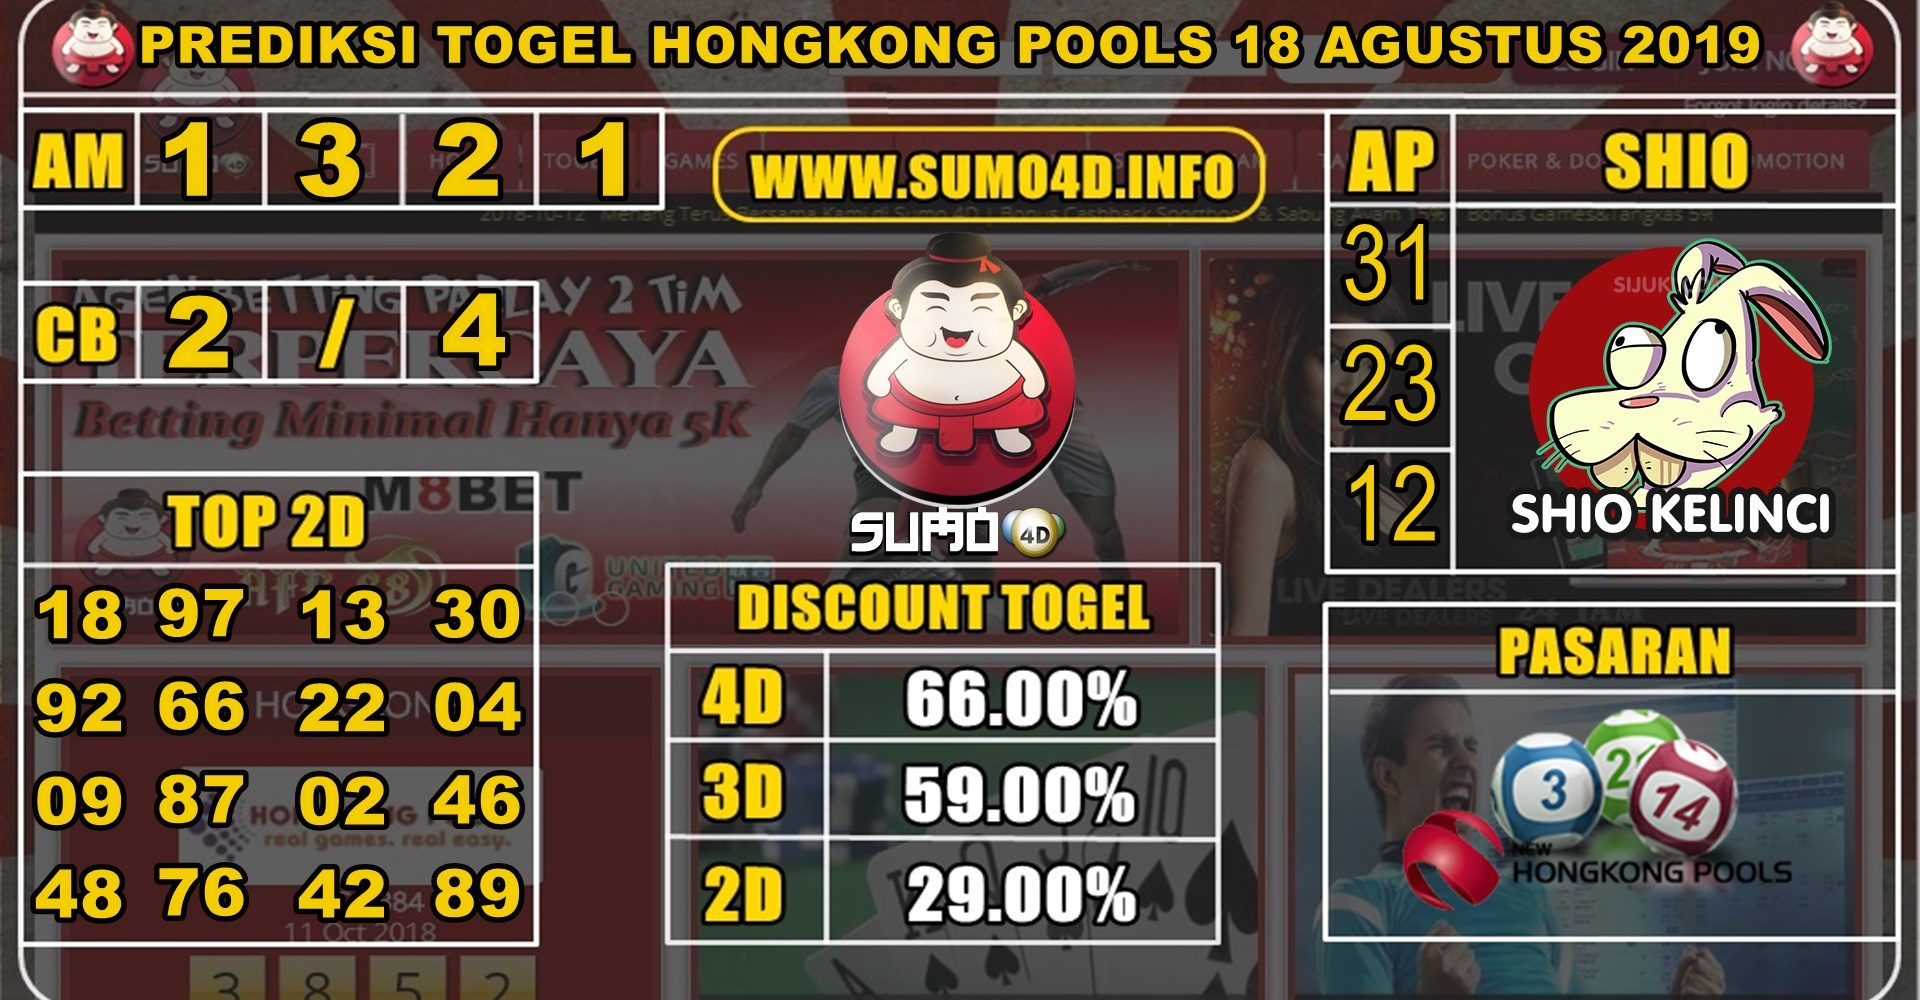 PREDIKSI TOGEL HONGKONG POOLS 18 AGUSTUS 2019